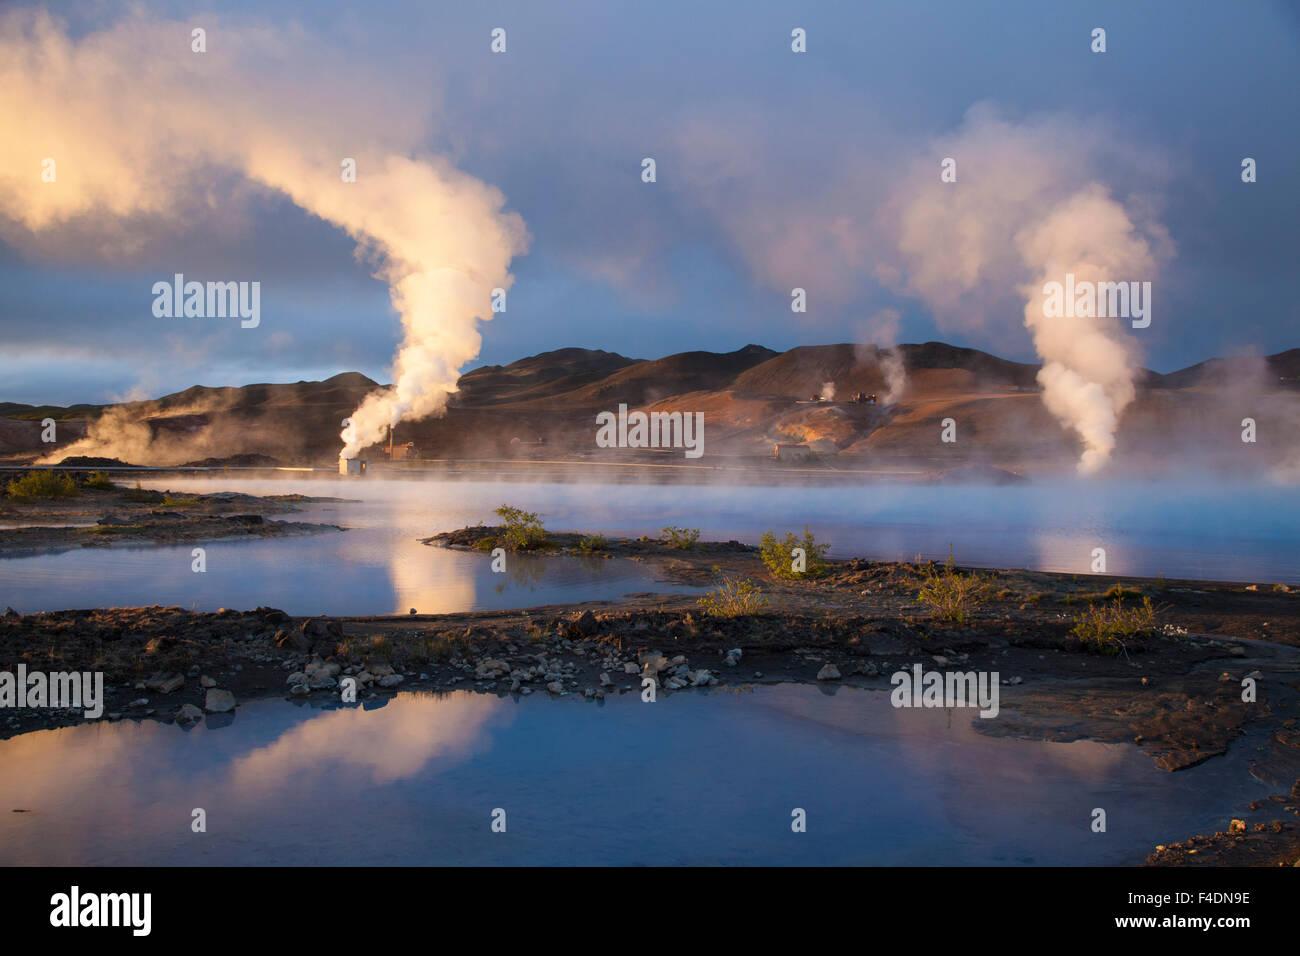 Coucher du soleil lumière sur Bjarnarflag geothermal power station, 73320 Nordhurland Eystra, Islande. Photo Stock